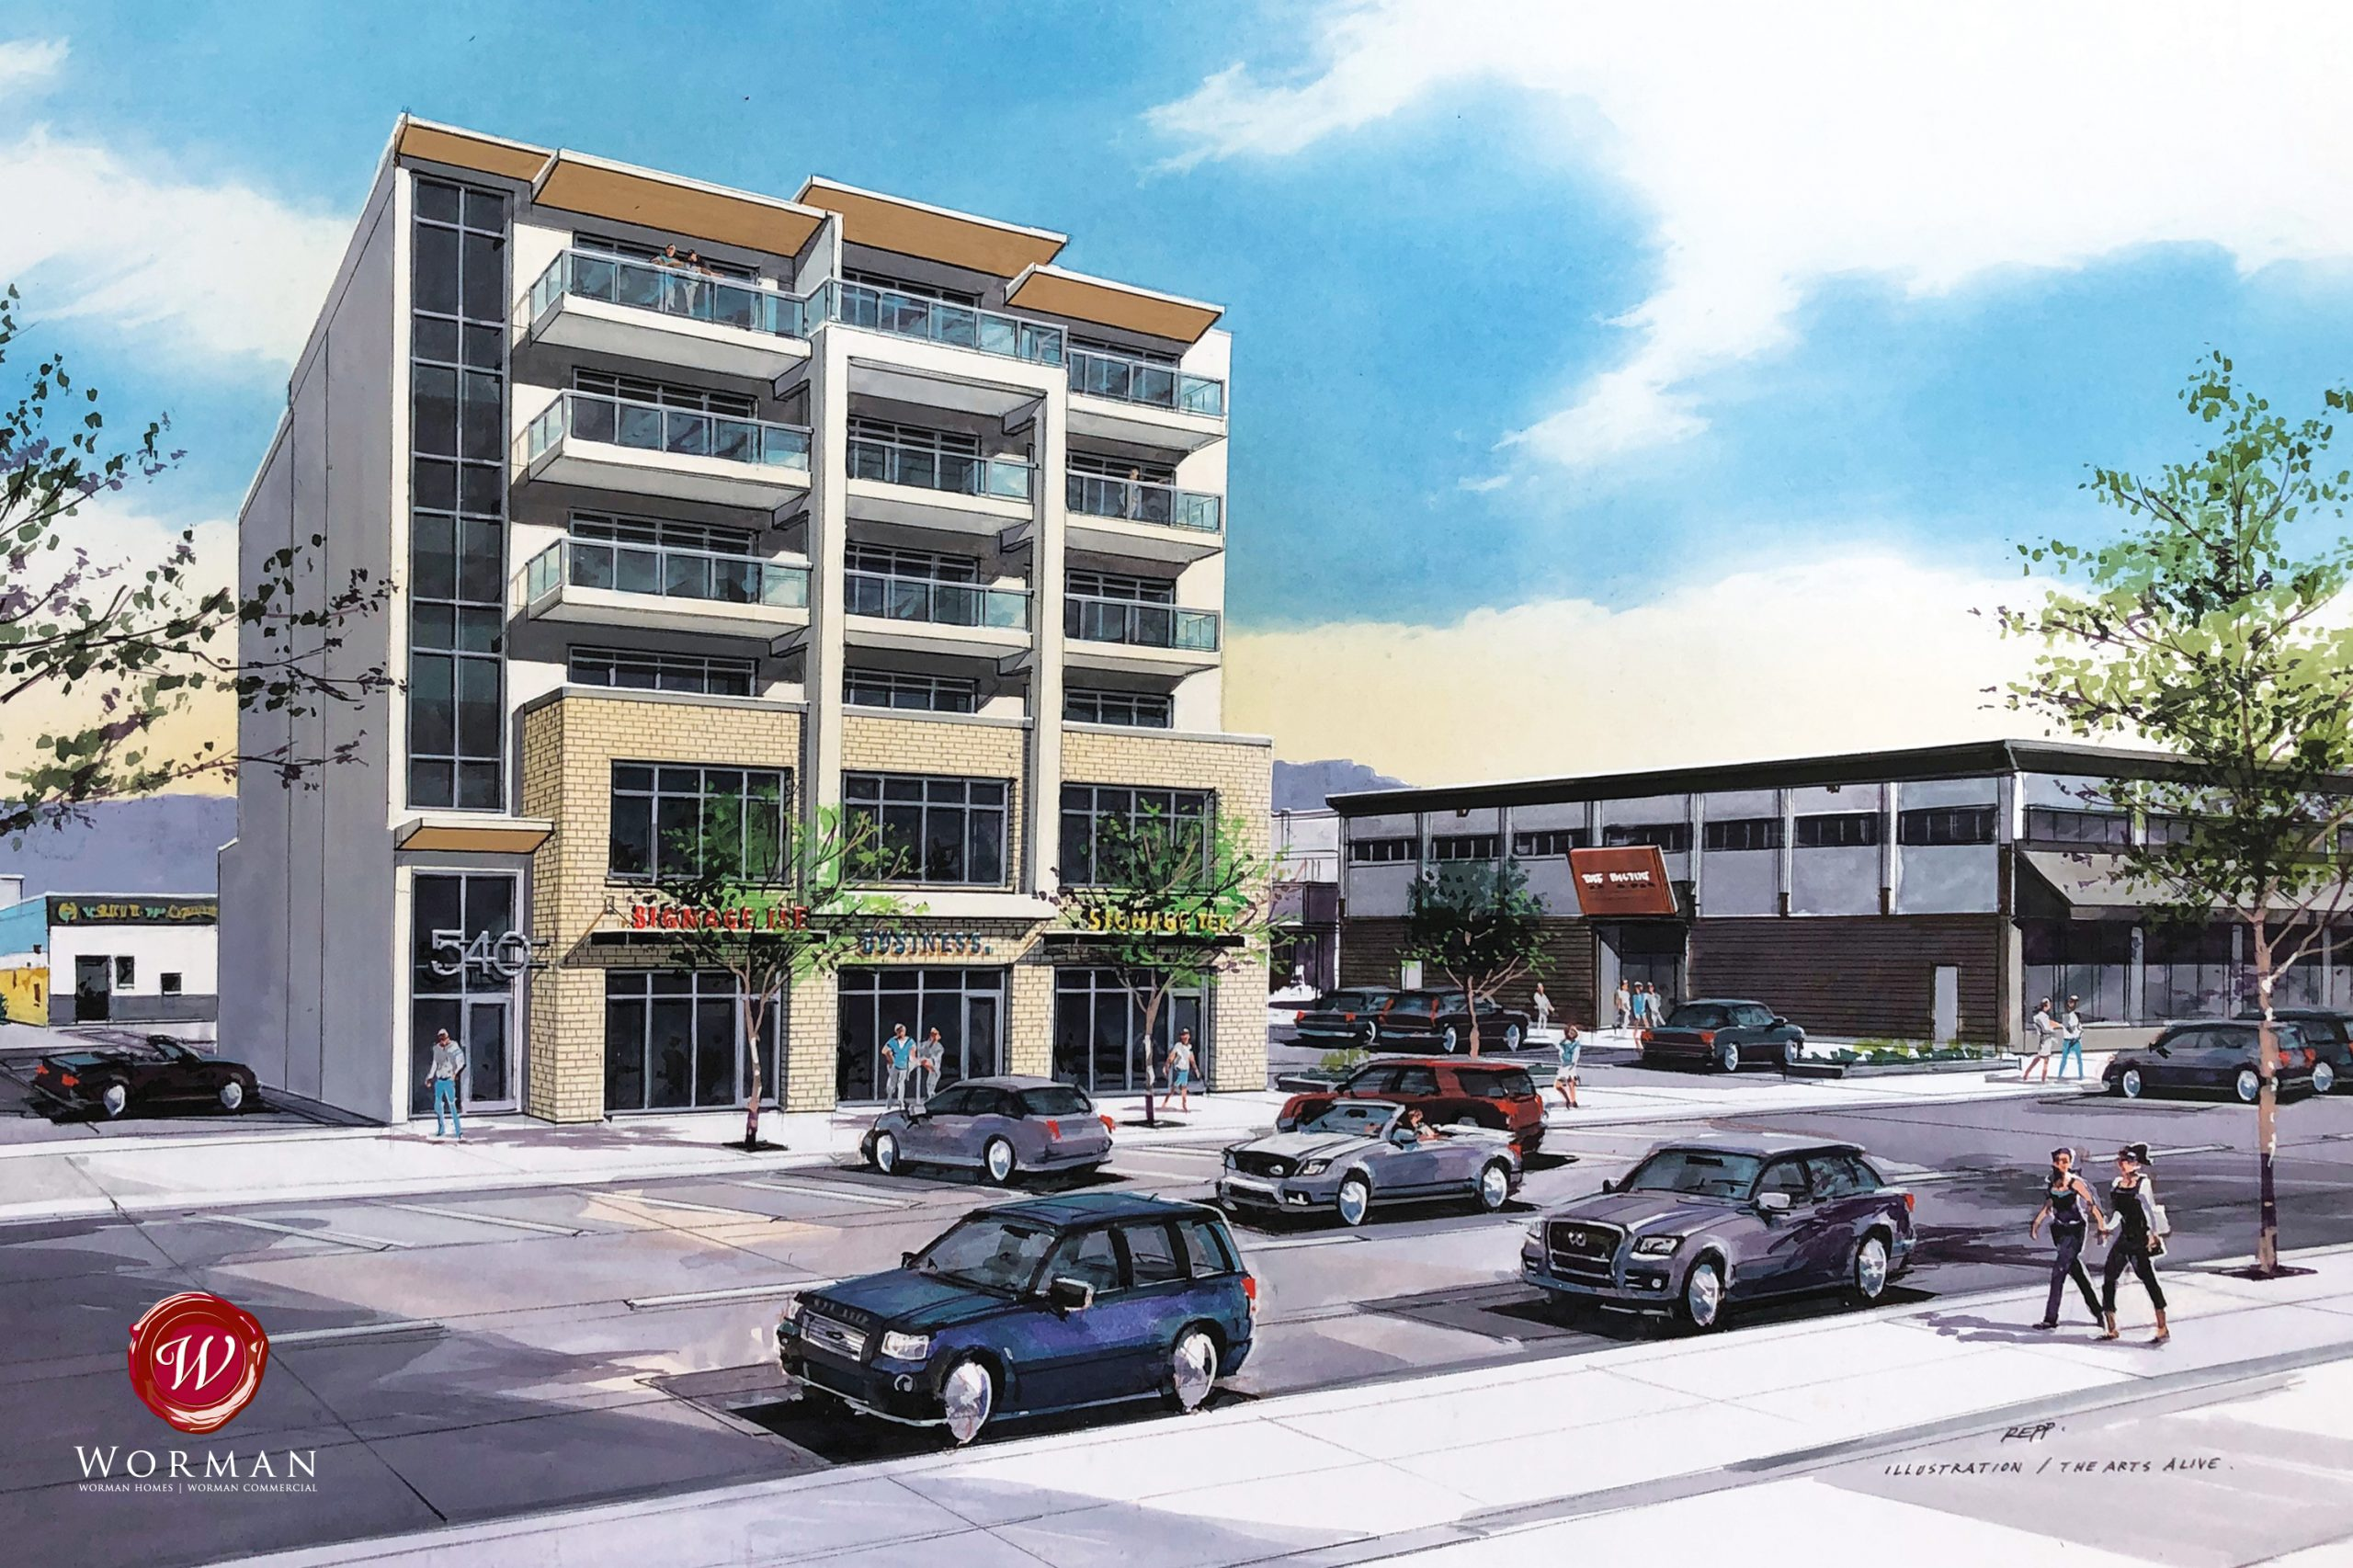 540 Lawrence Avenue, Kelowna, BC - Leasing Opportunities in New Downtown Kelowna Mixed-Use Development